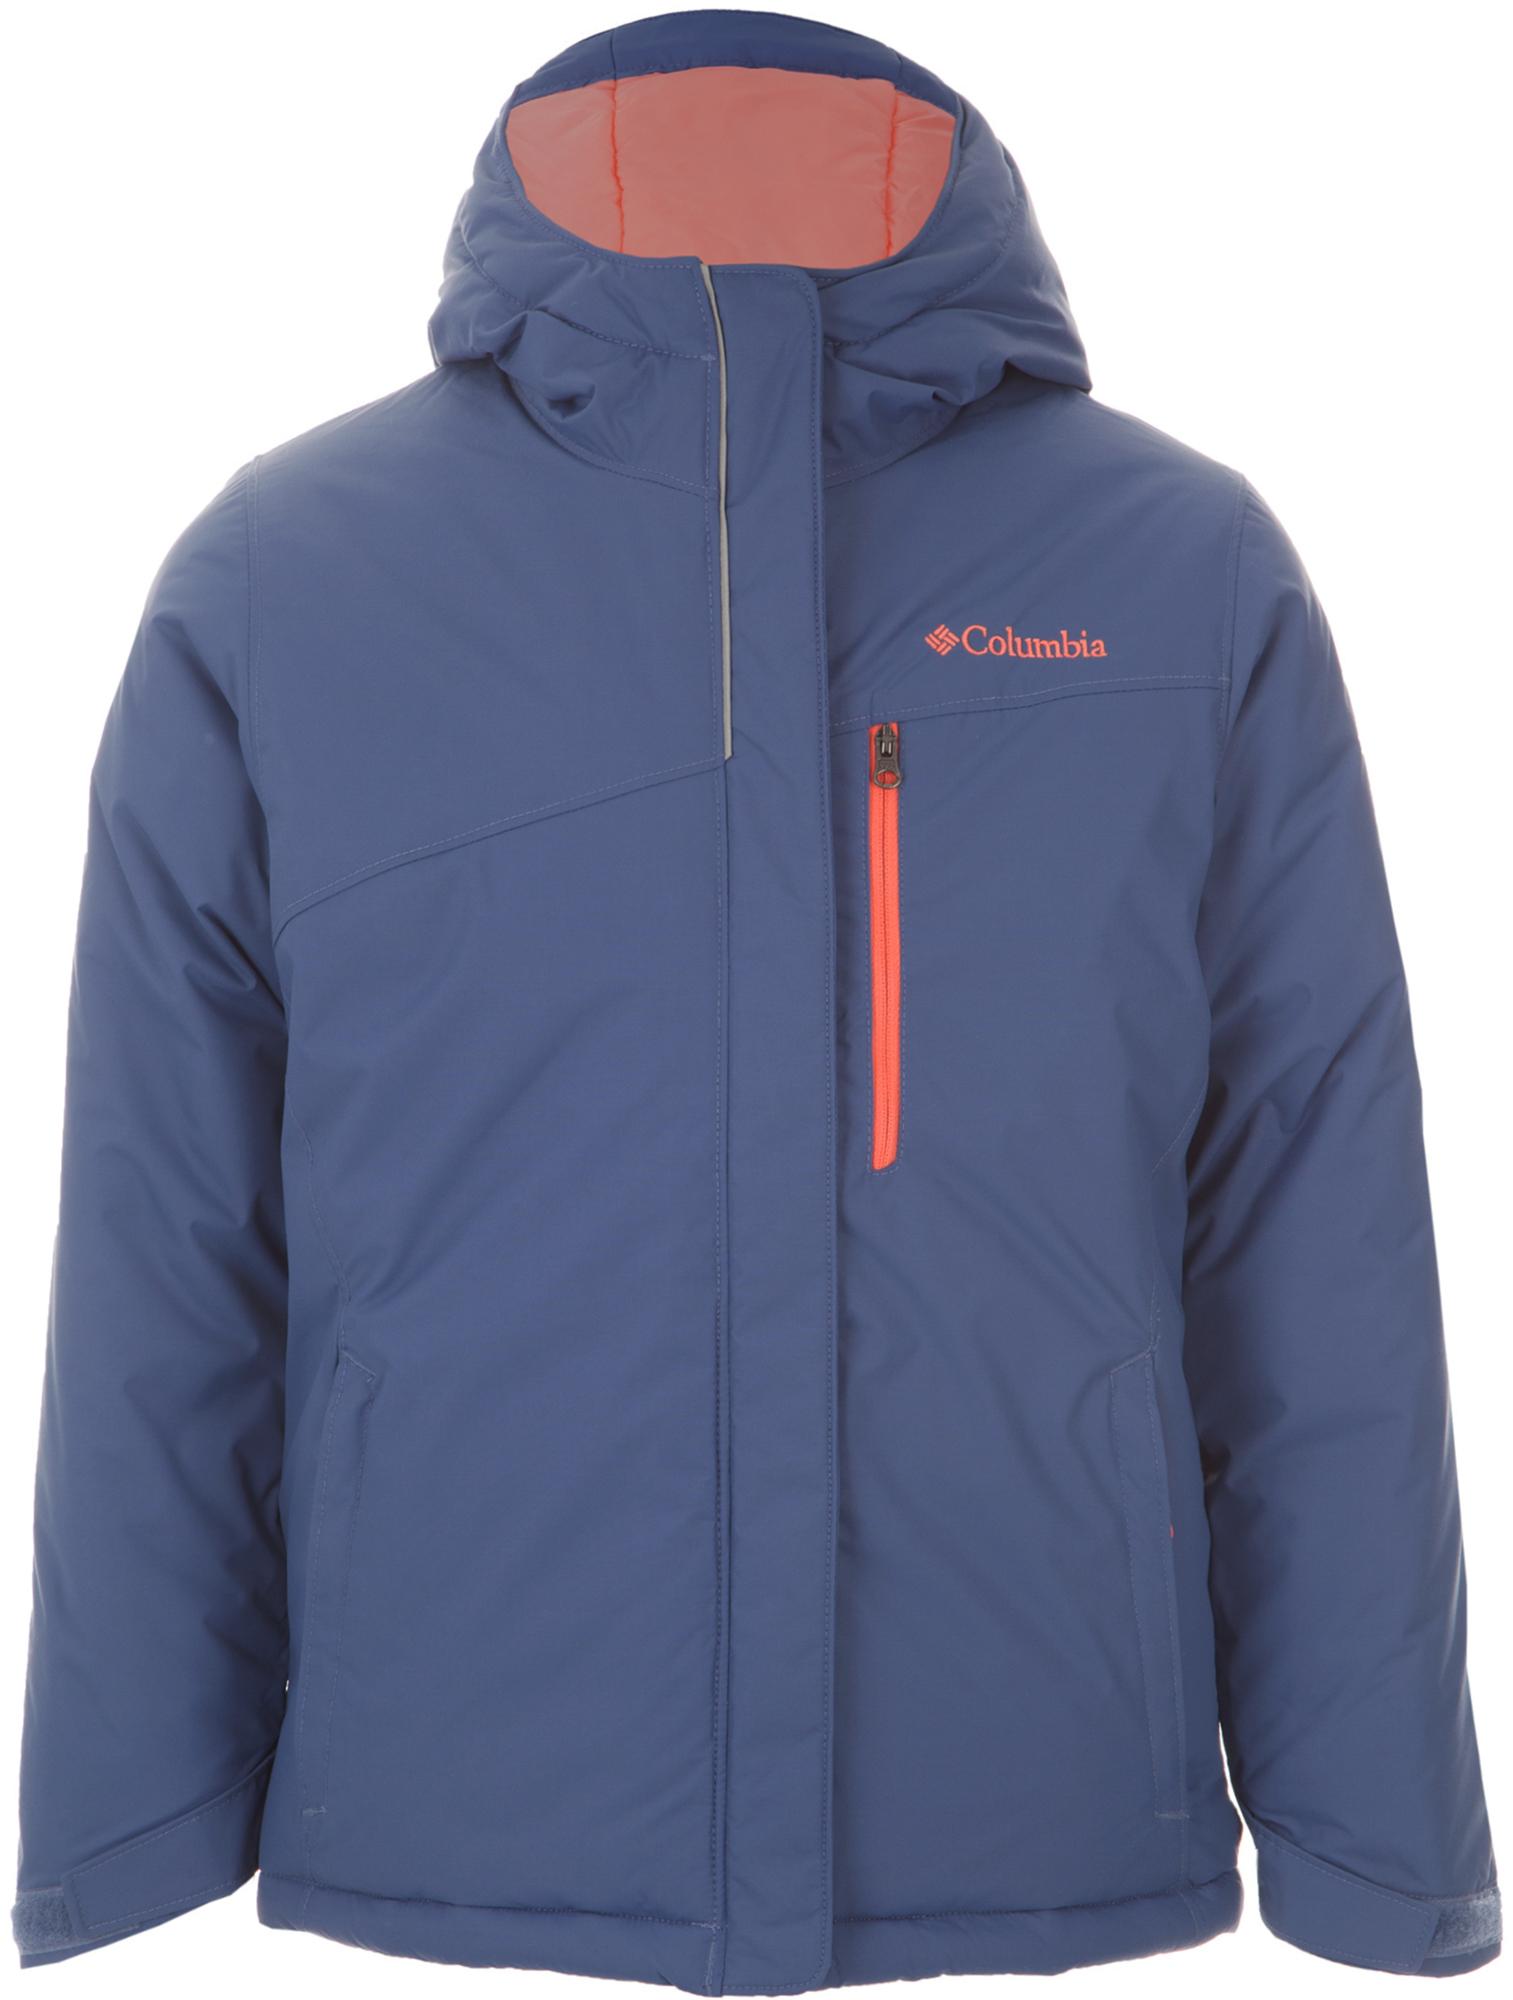 Columbia Куртка утепленная для девочек Columbia Alpine Free Fall, размер 137-147